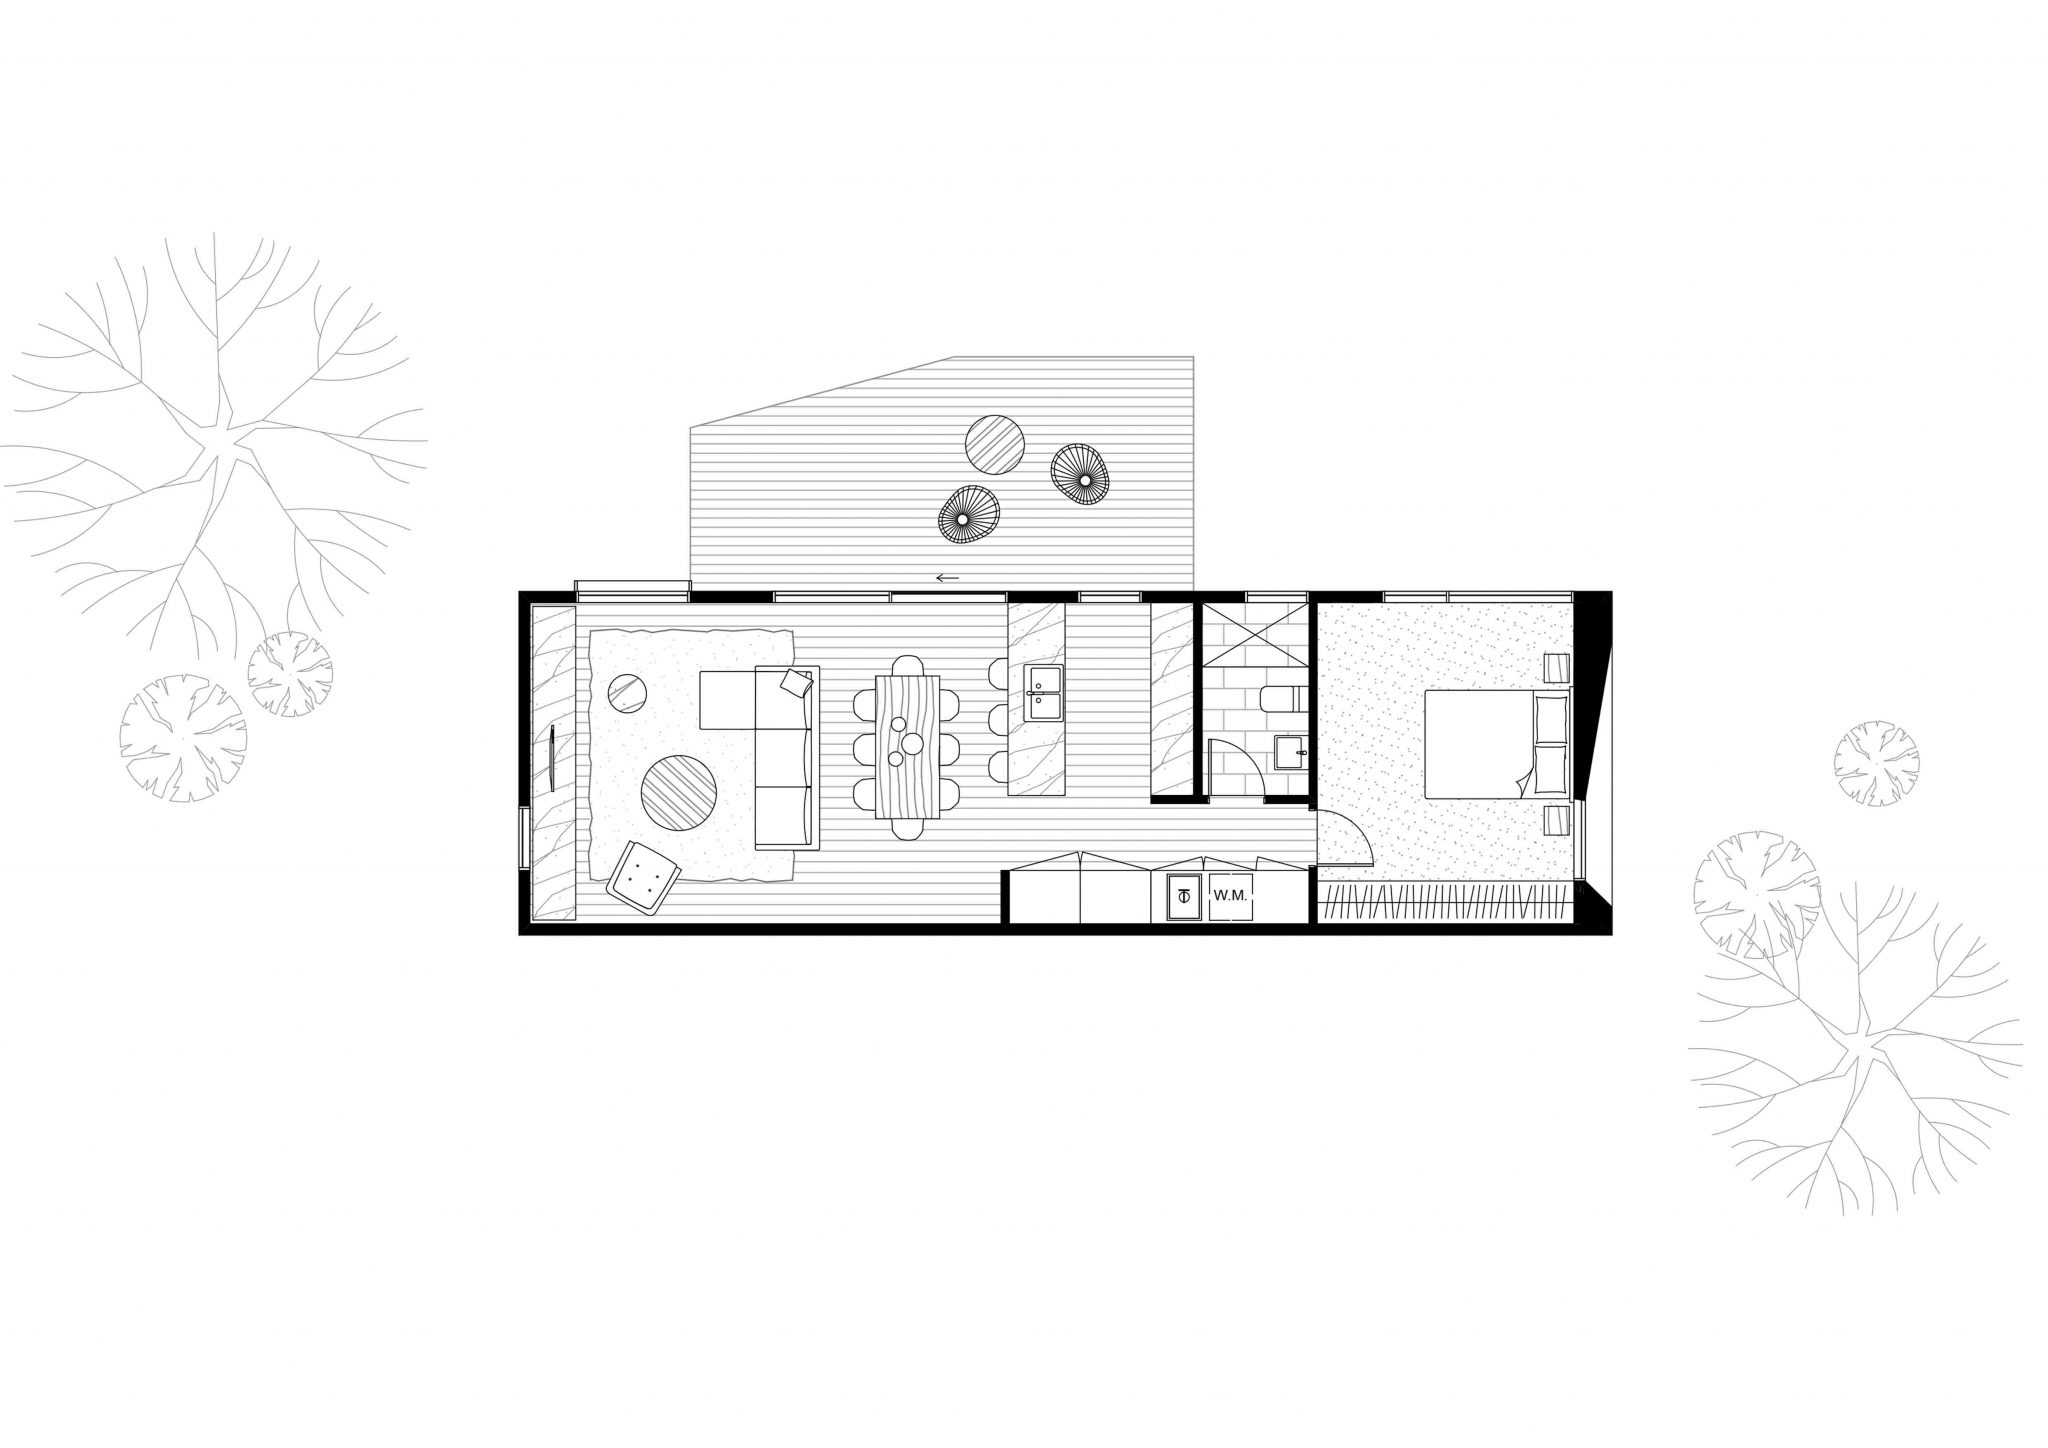 marlo floor plan image